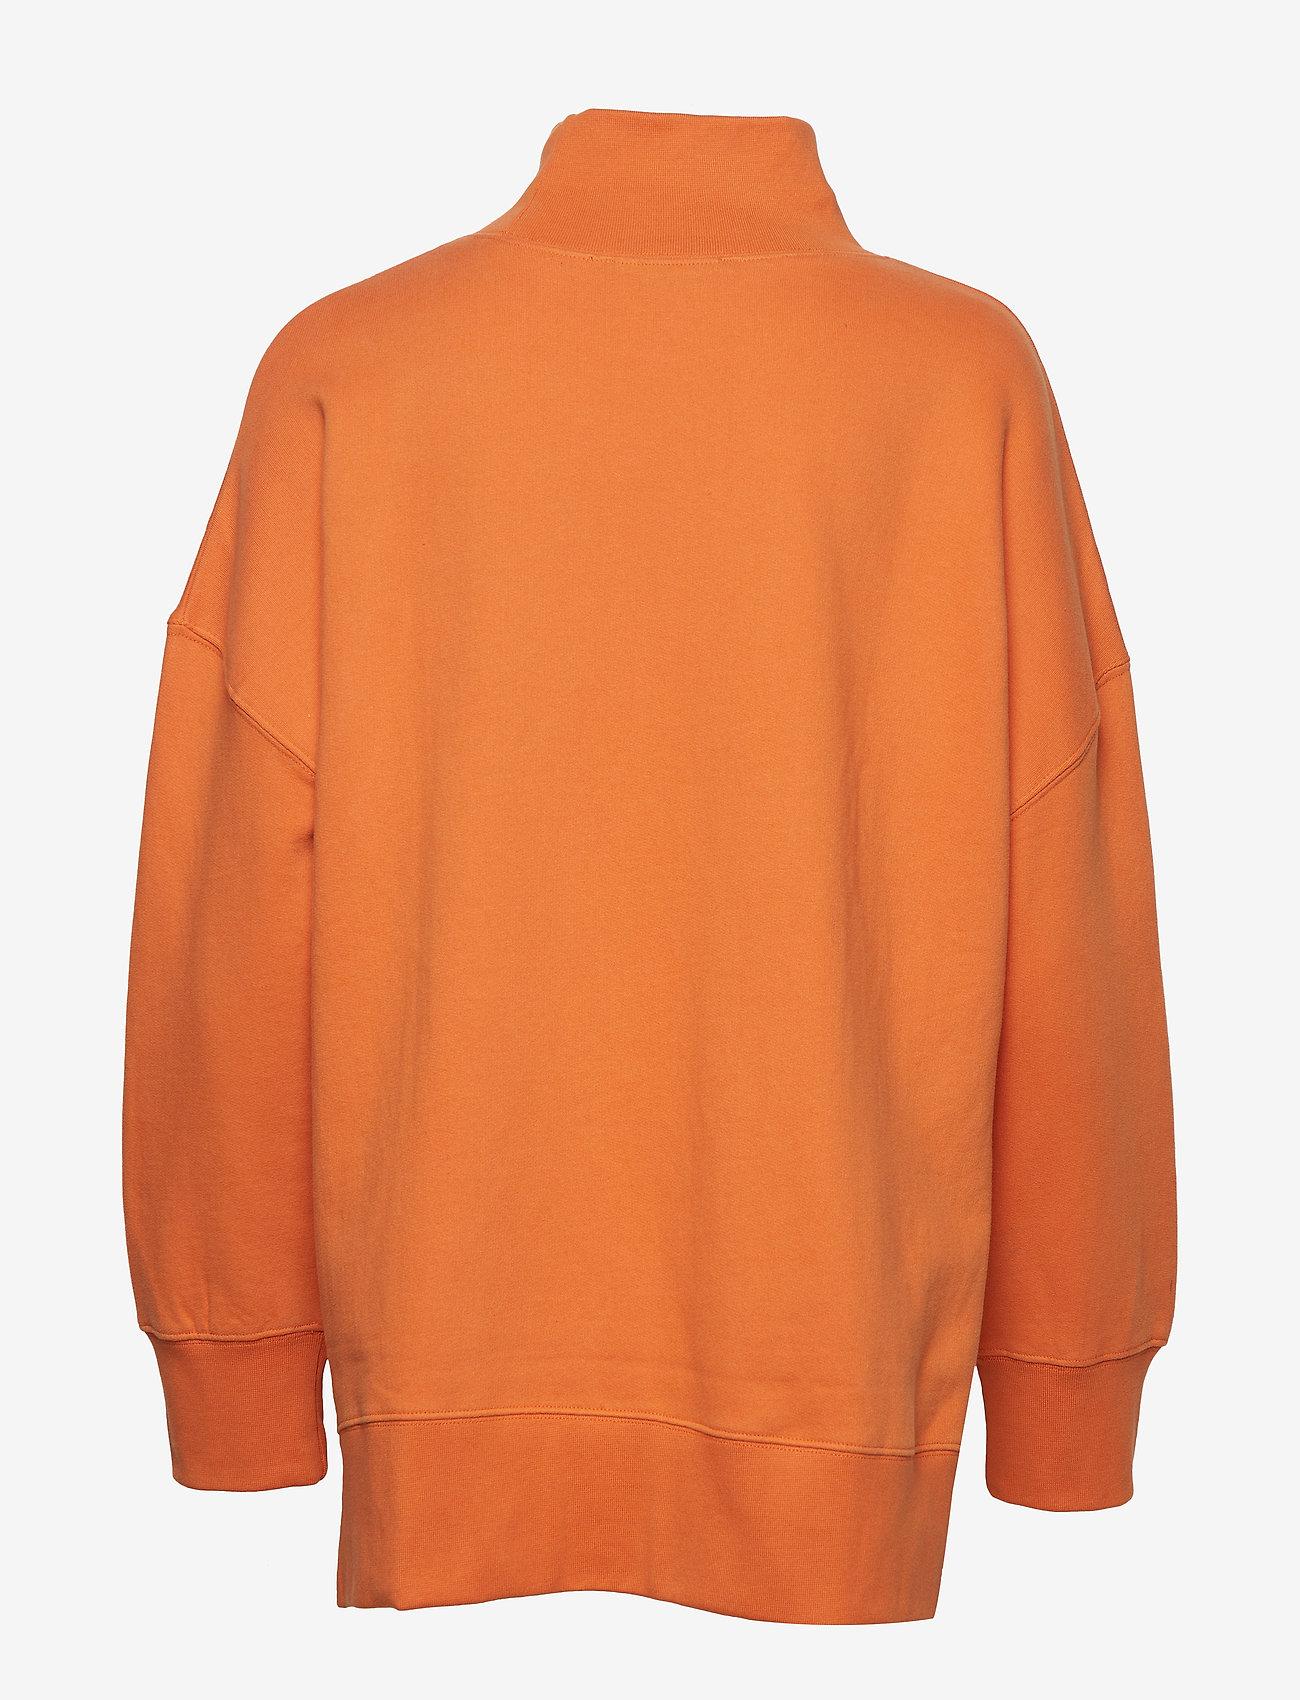 French Connection - SUNDAY SWEAT HNCK SIDE SPLIT - sweatshirts - jaffa orange - 1